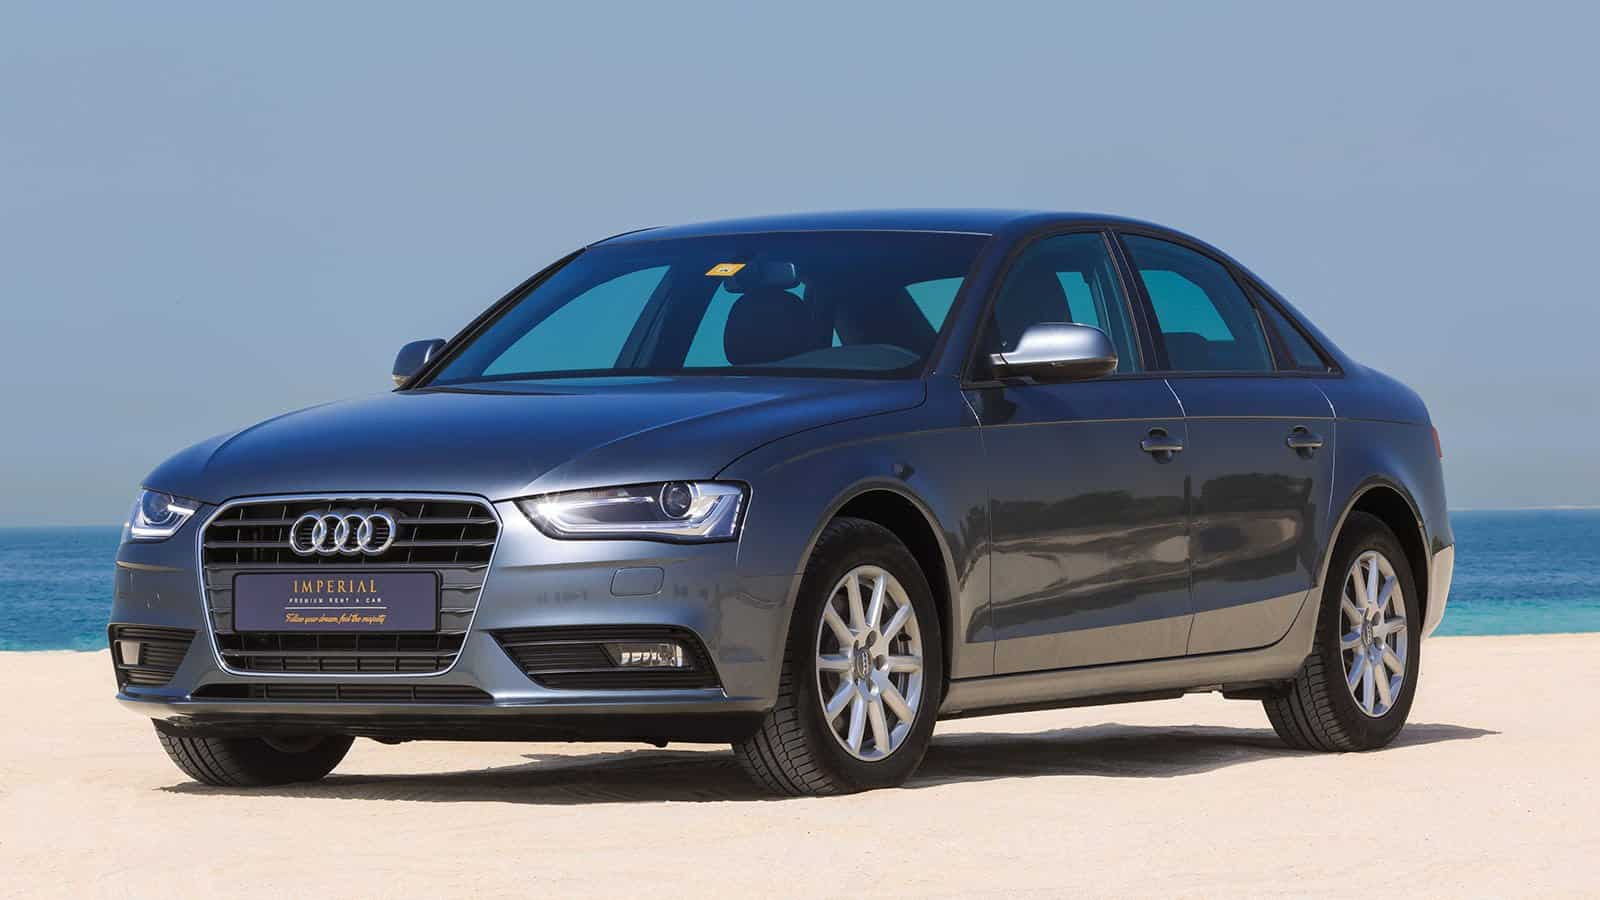 Audi A4 car rent Dubai